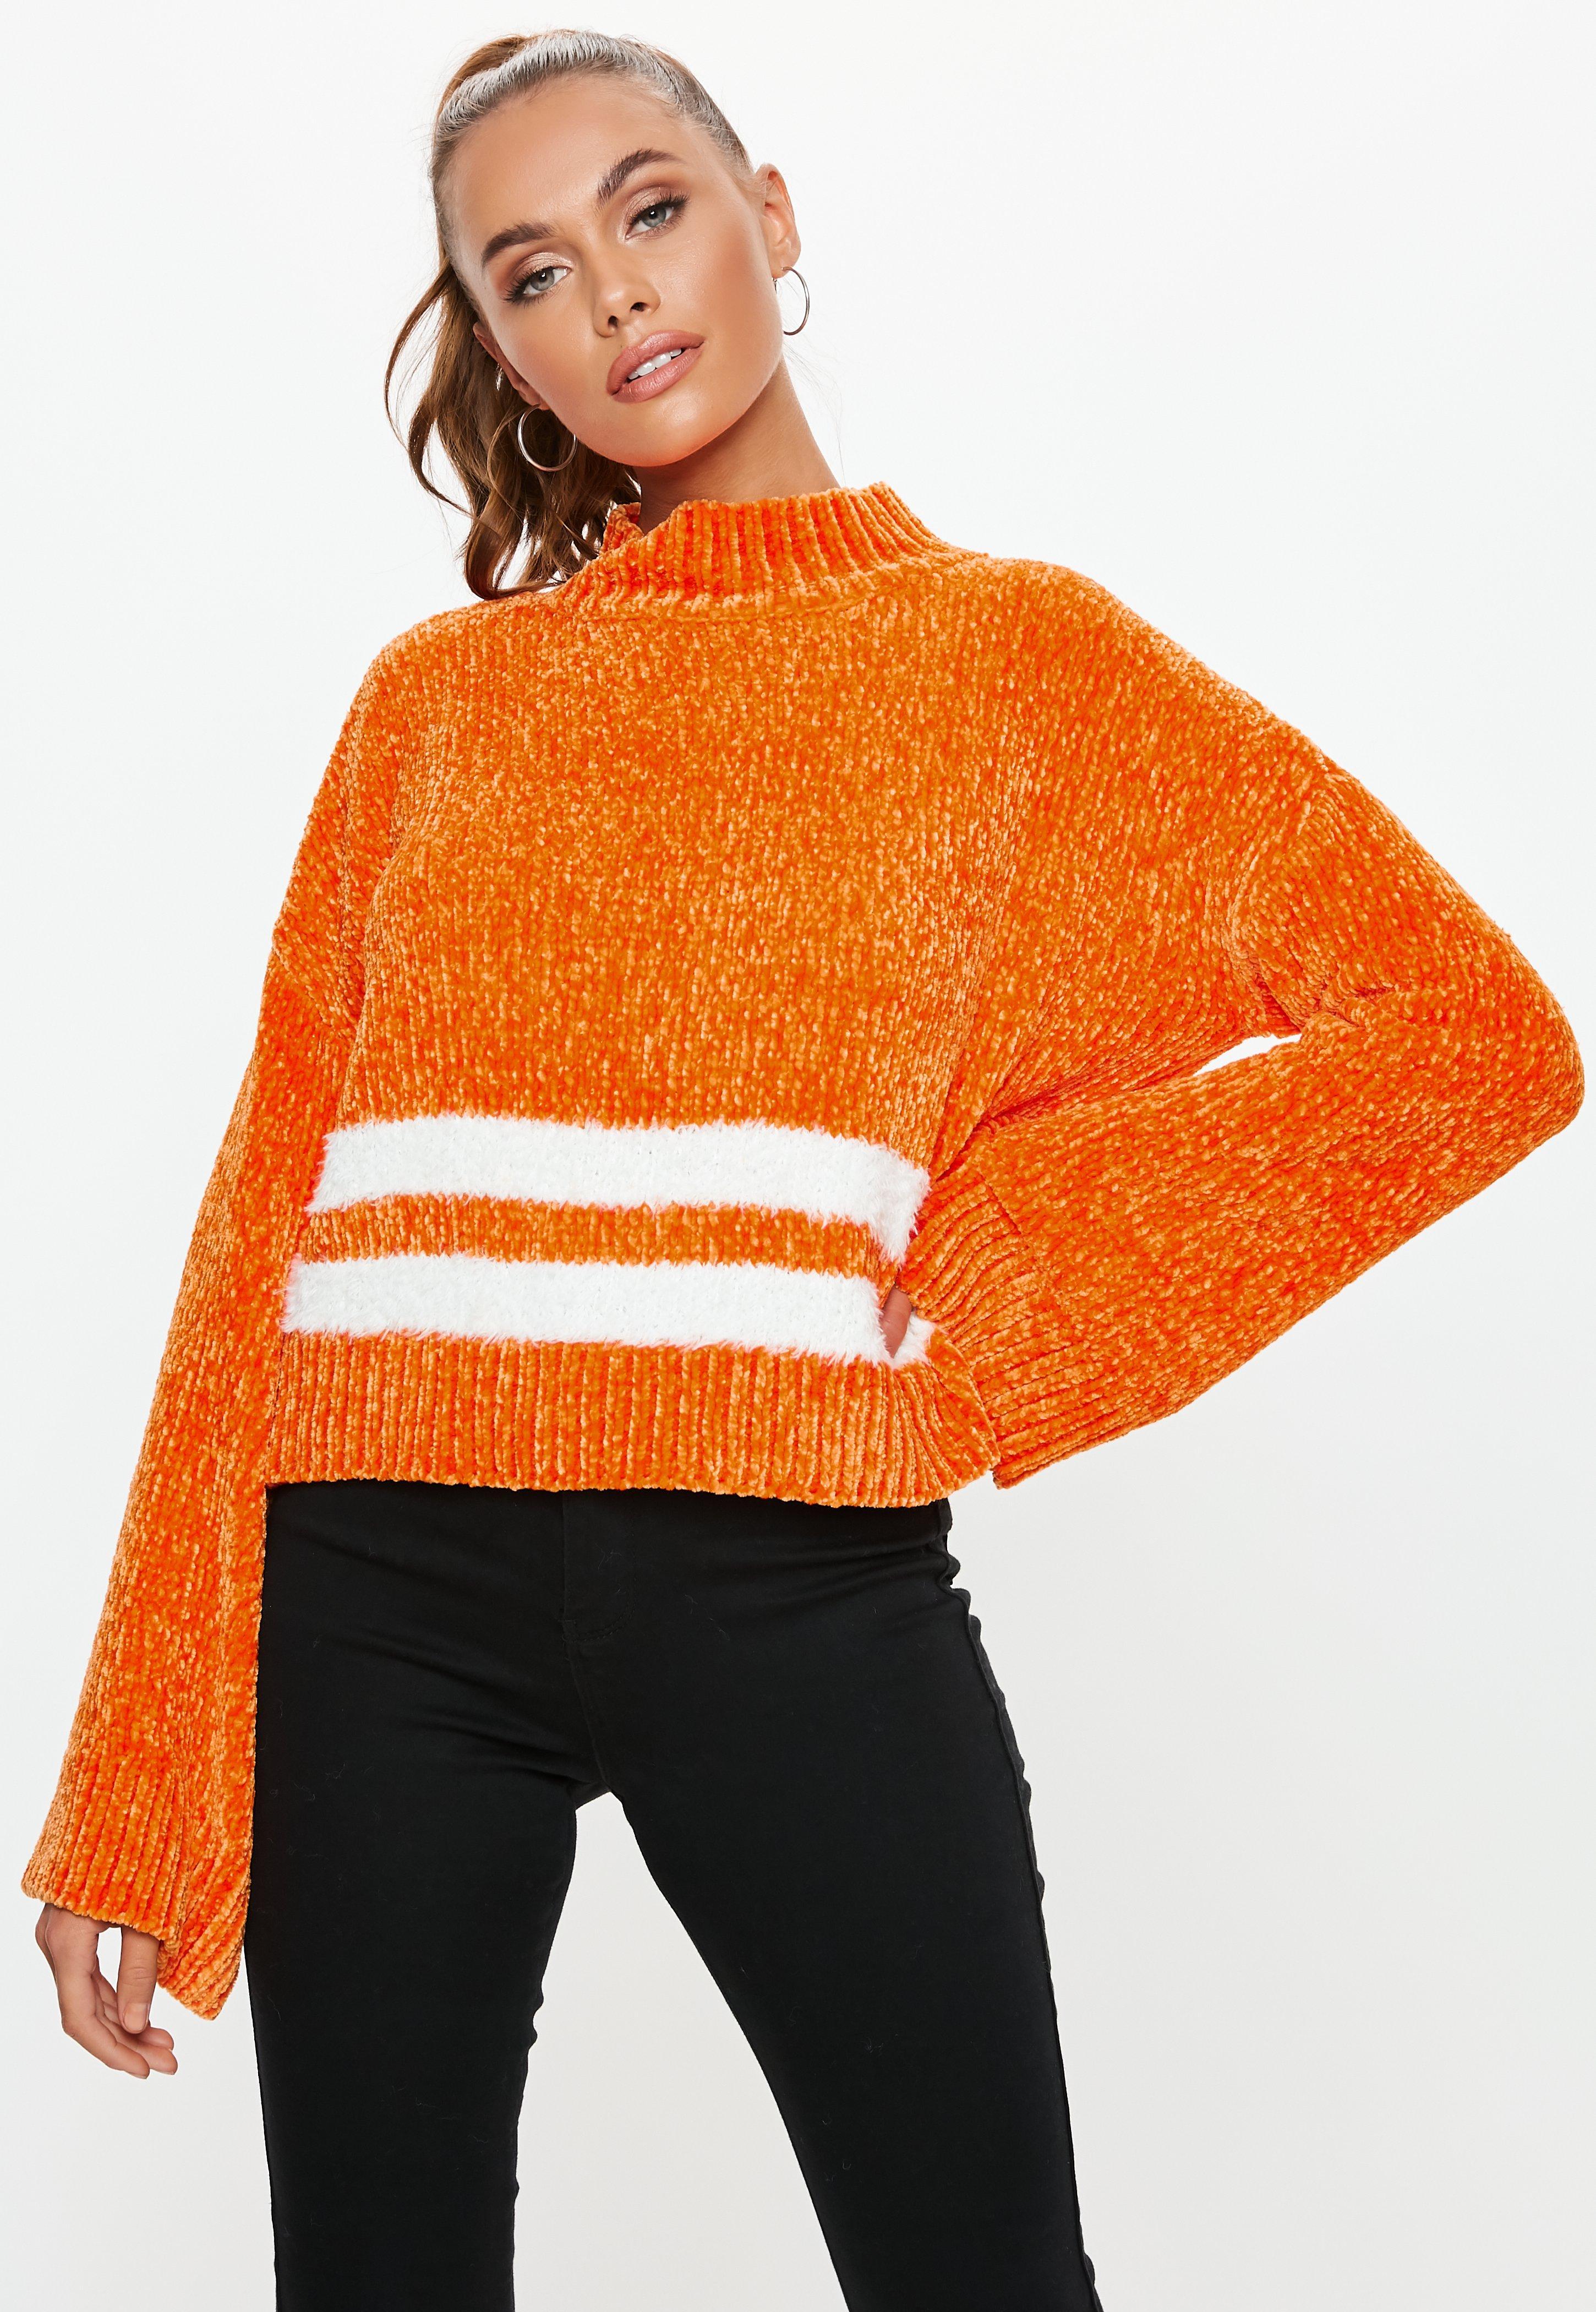 Chenille Montant Et En Rayures Court Col Orange Pull Design 4R5Aq3jL